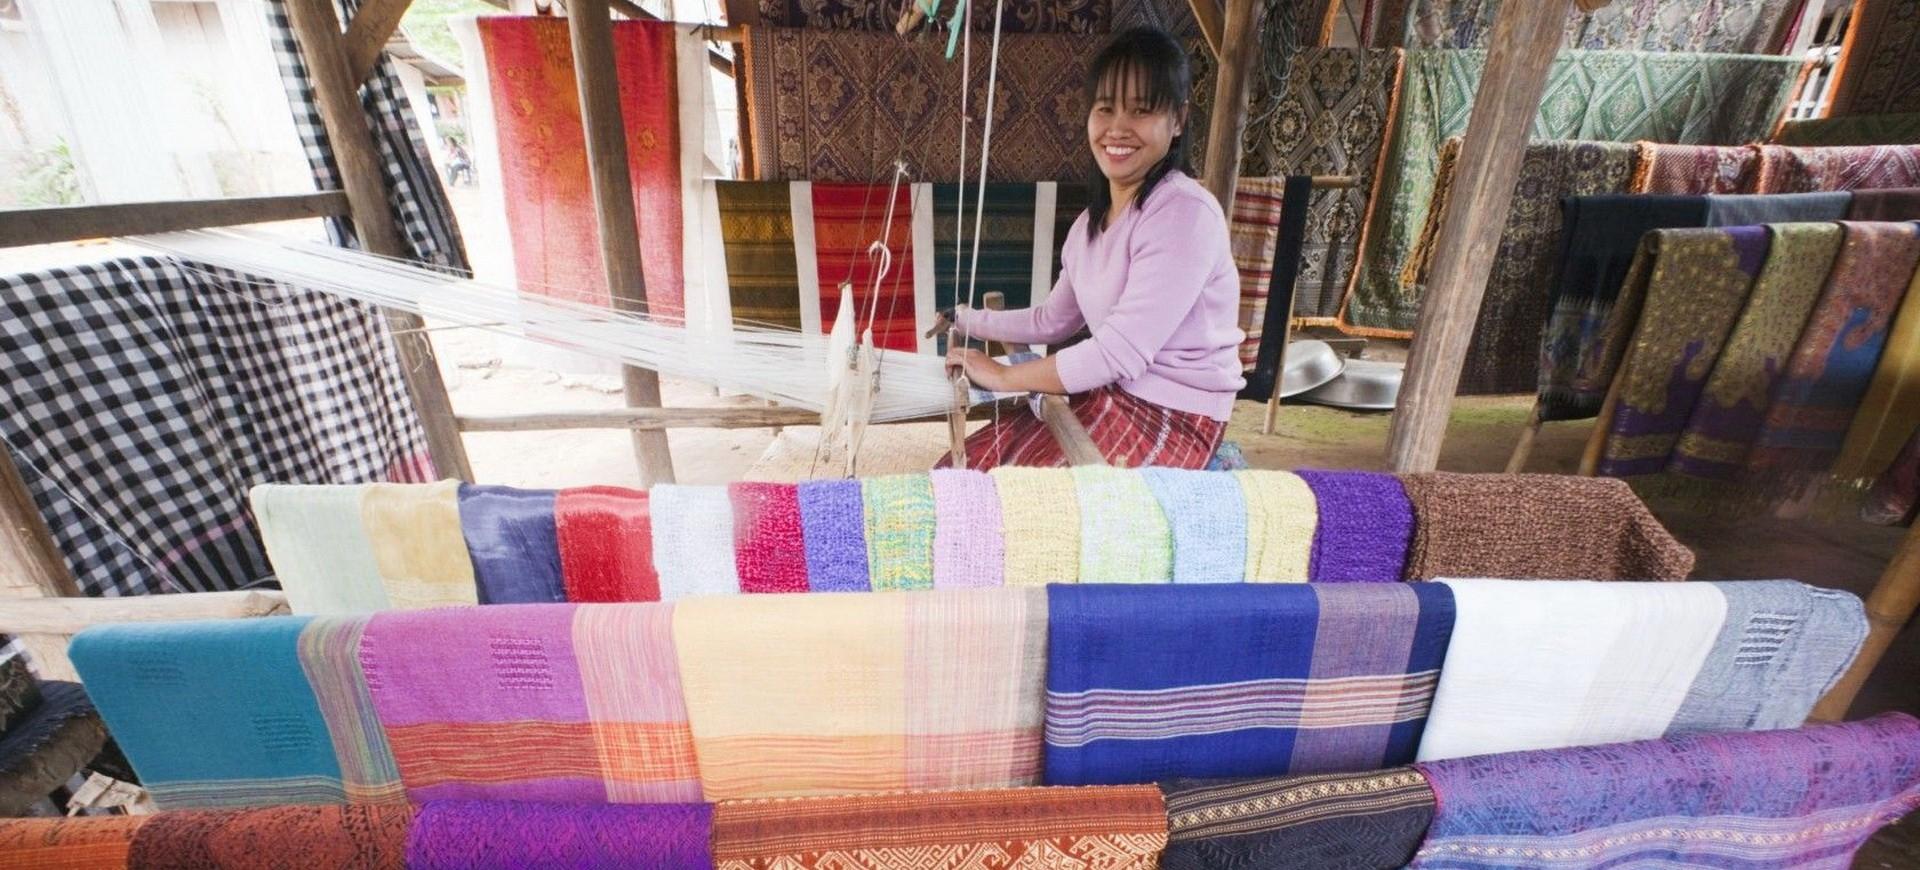 Laos Luang Prabang Atelier de tissage